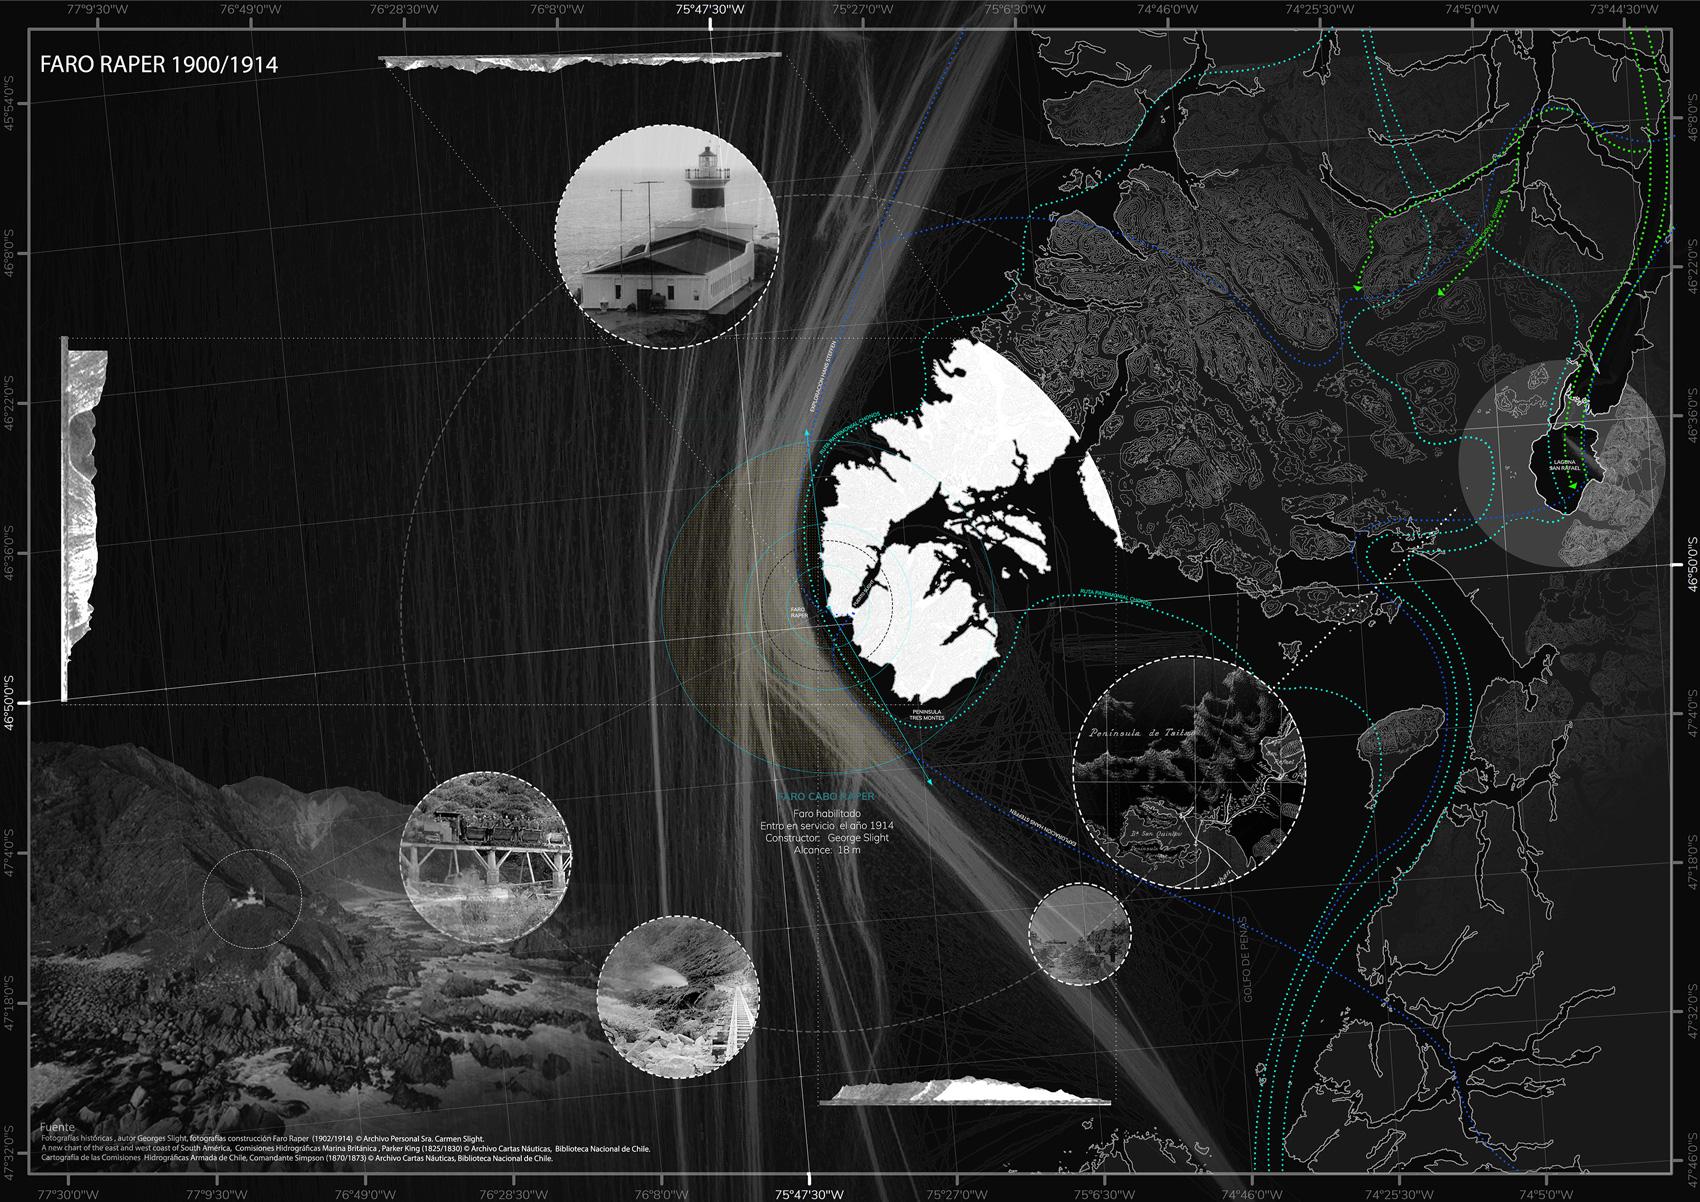 (2)-Infografía-Cabo-Raper-©-Claudio-Araya-A.jpg